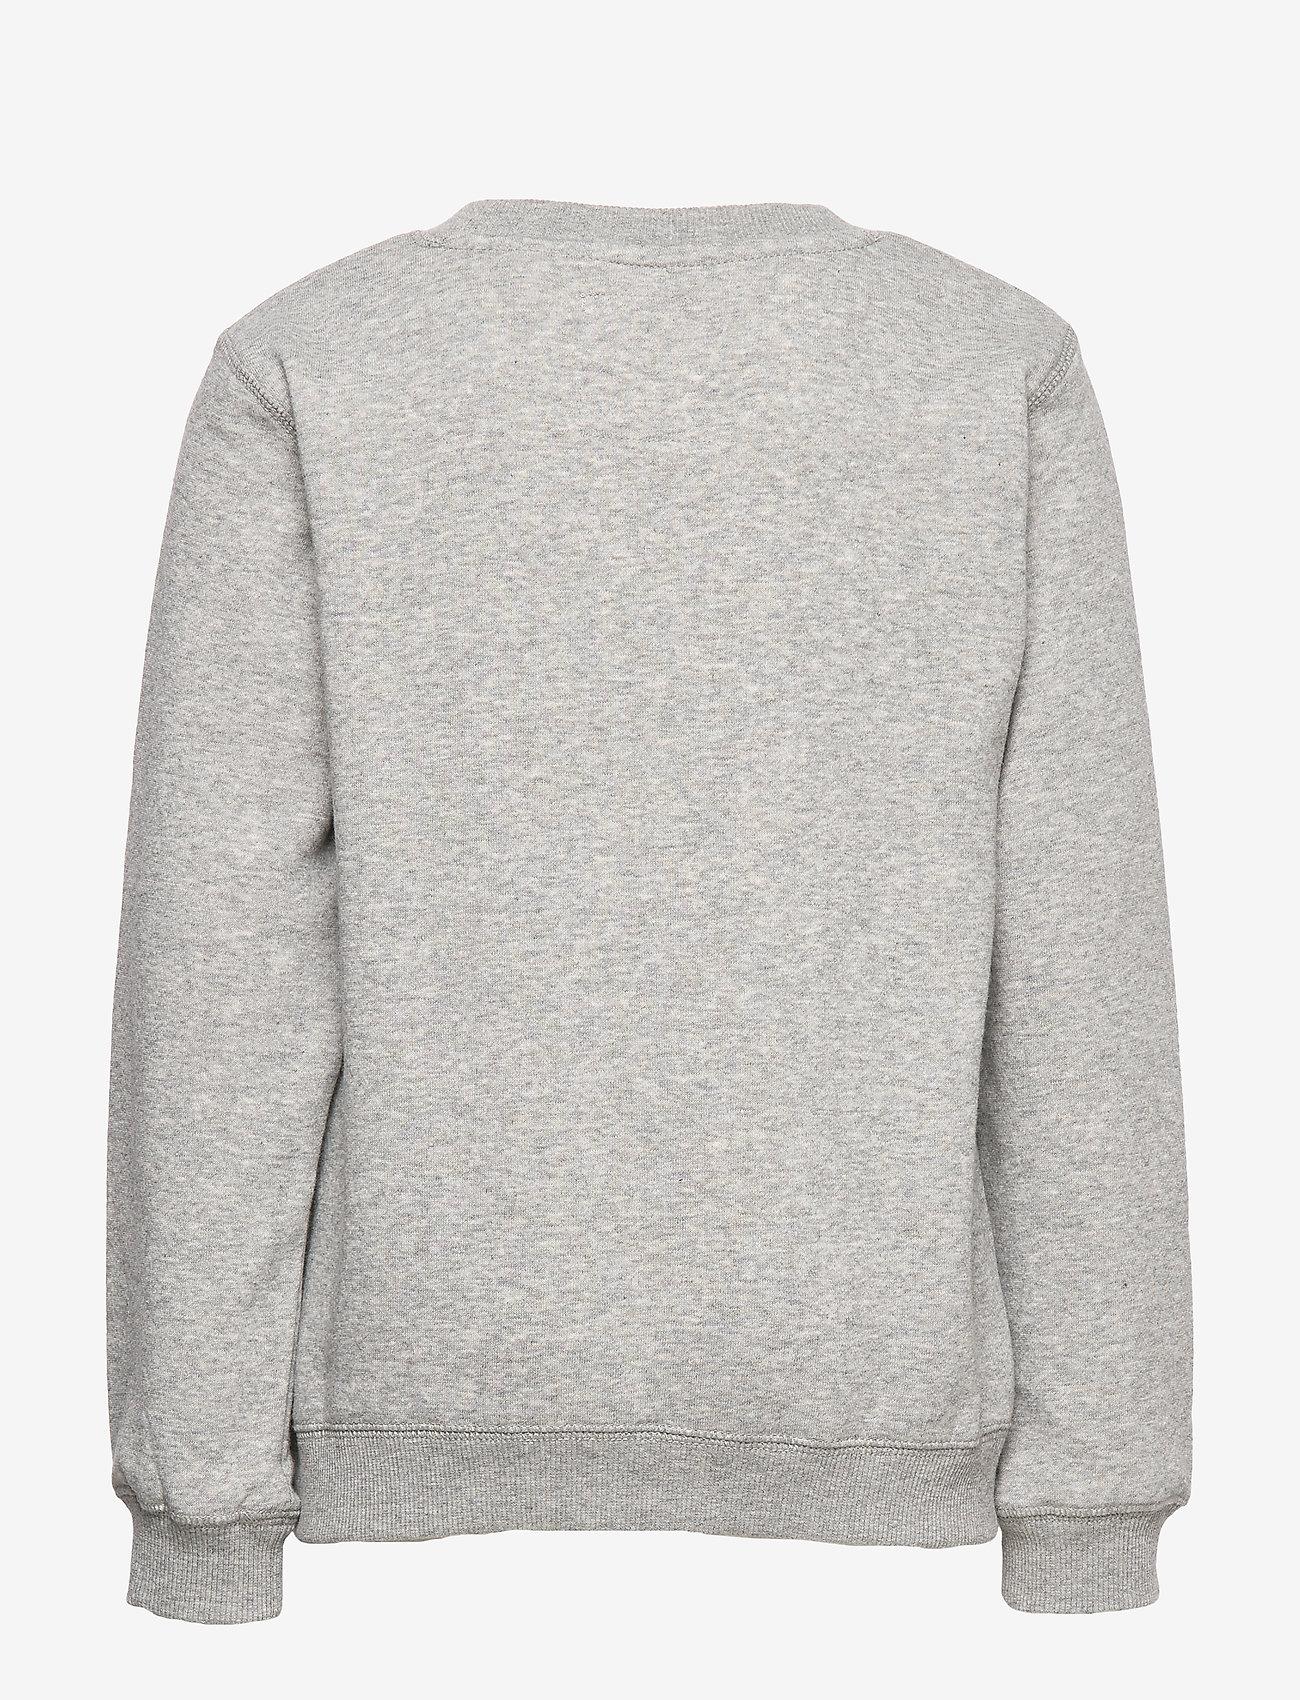 Levi's - SWEAT SHIRT - sweatshirts - peche - 1